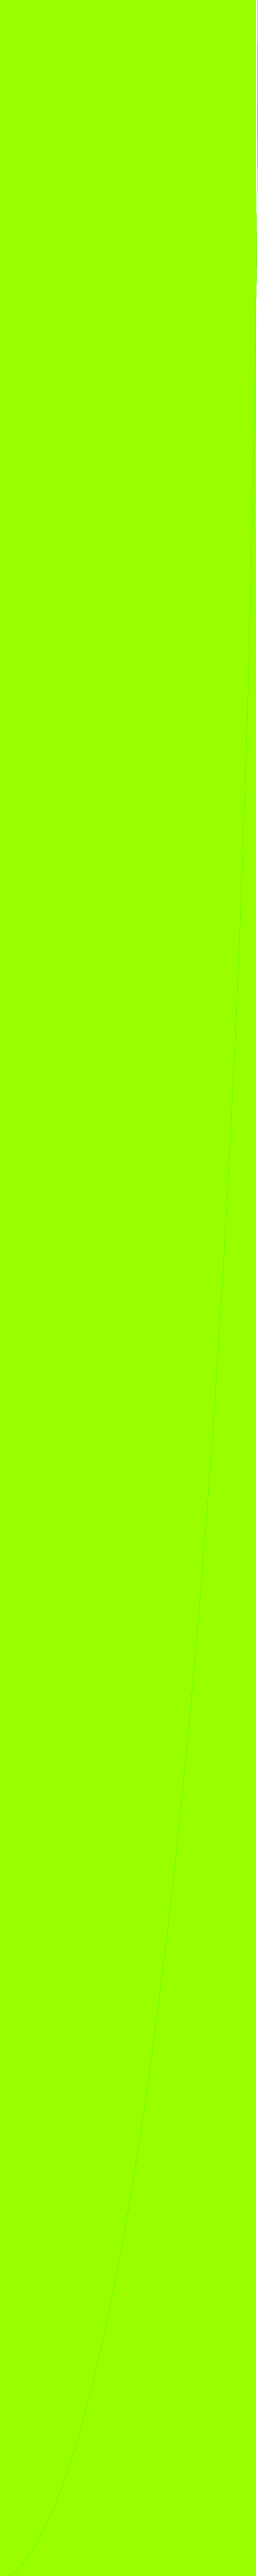 rayon-vert-15000-v2